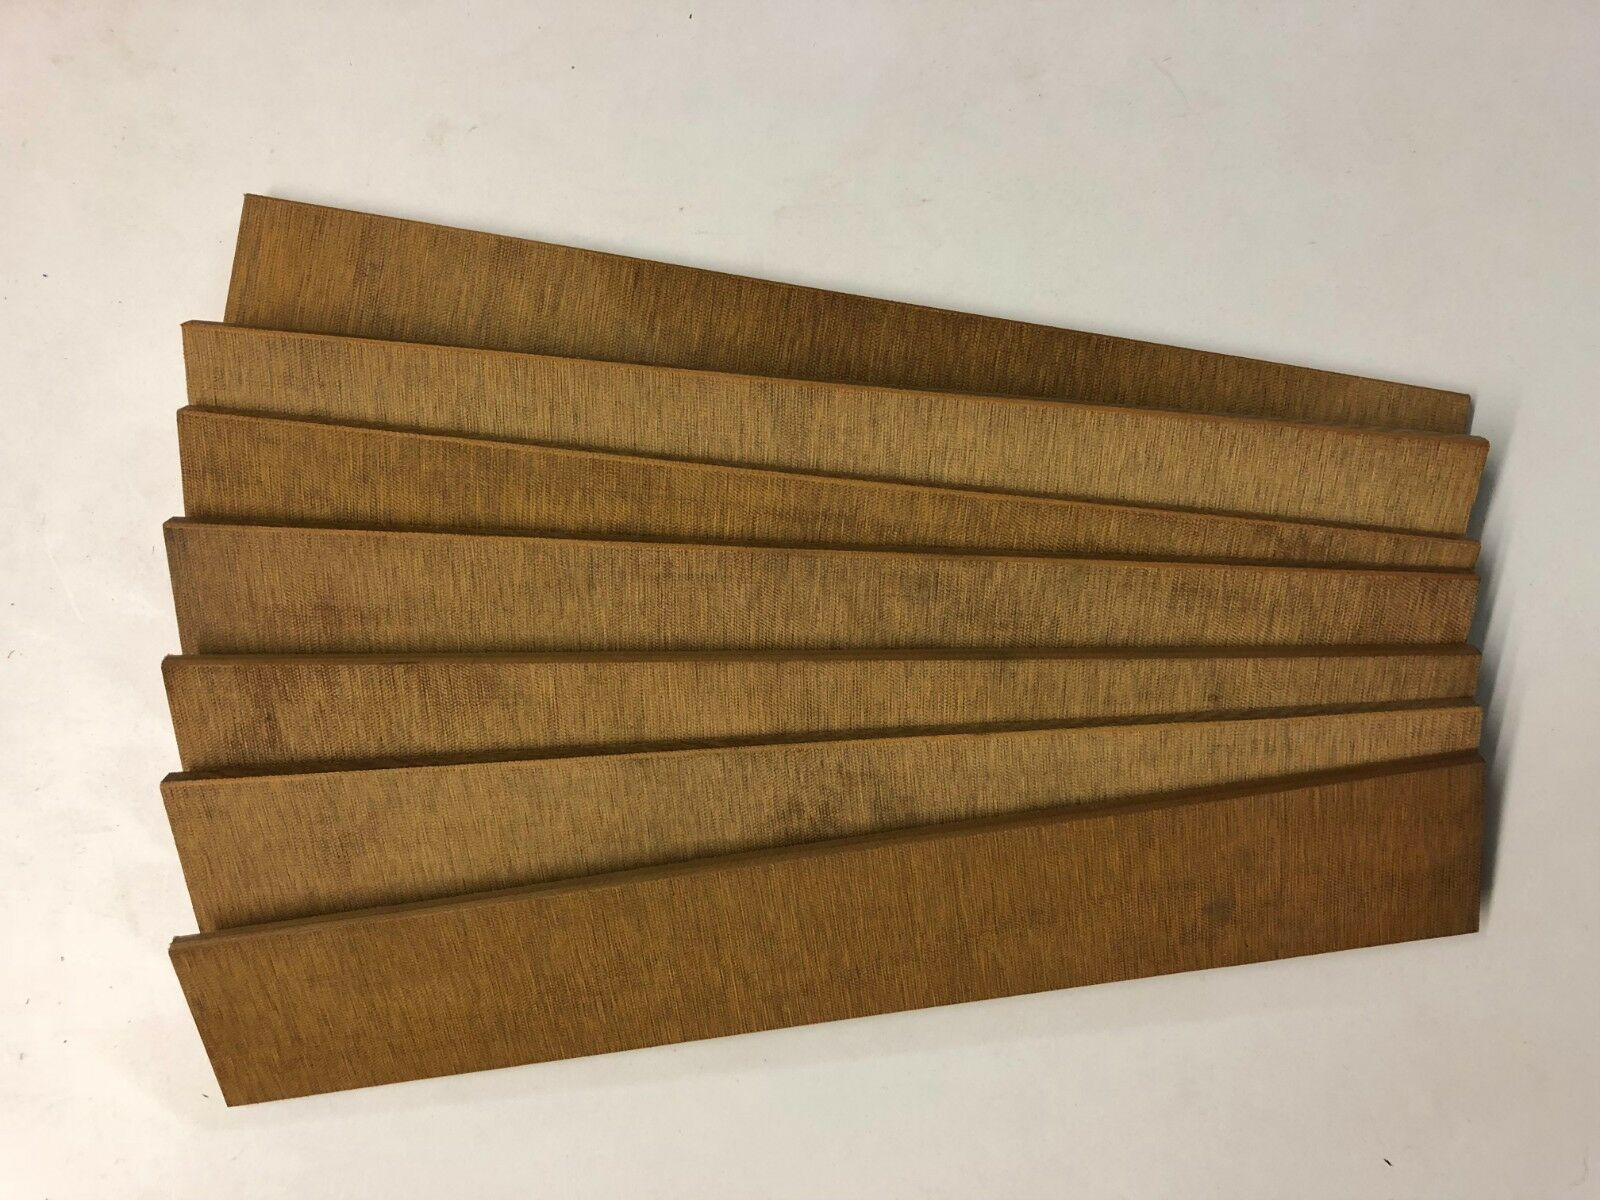 SLURRY TANKER VANES 300x46.5x6.3 Set Of 7 Mec5000